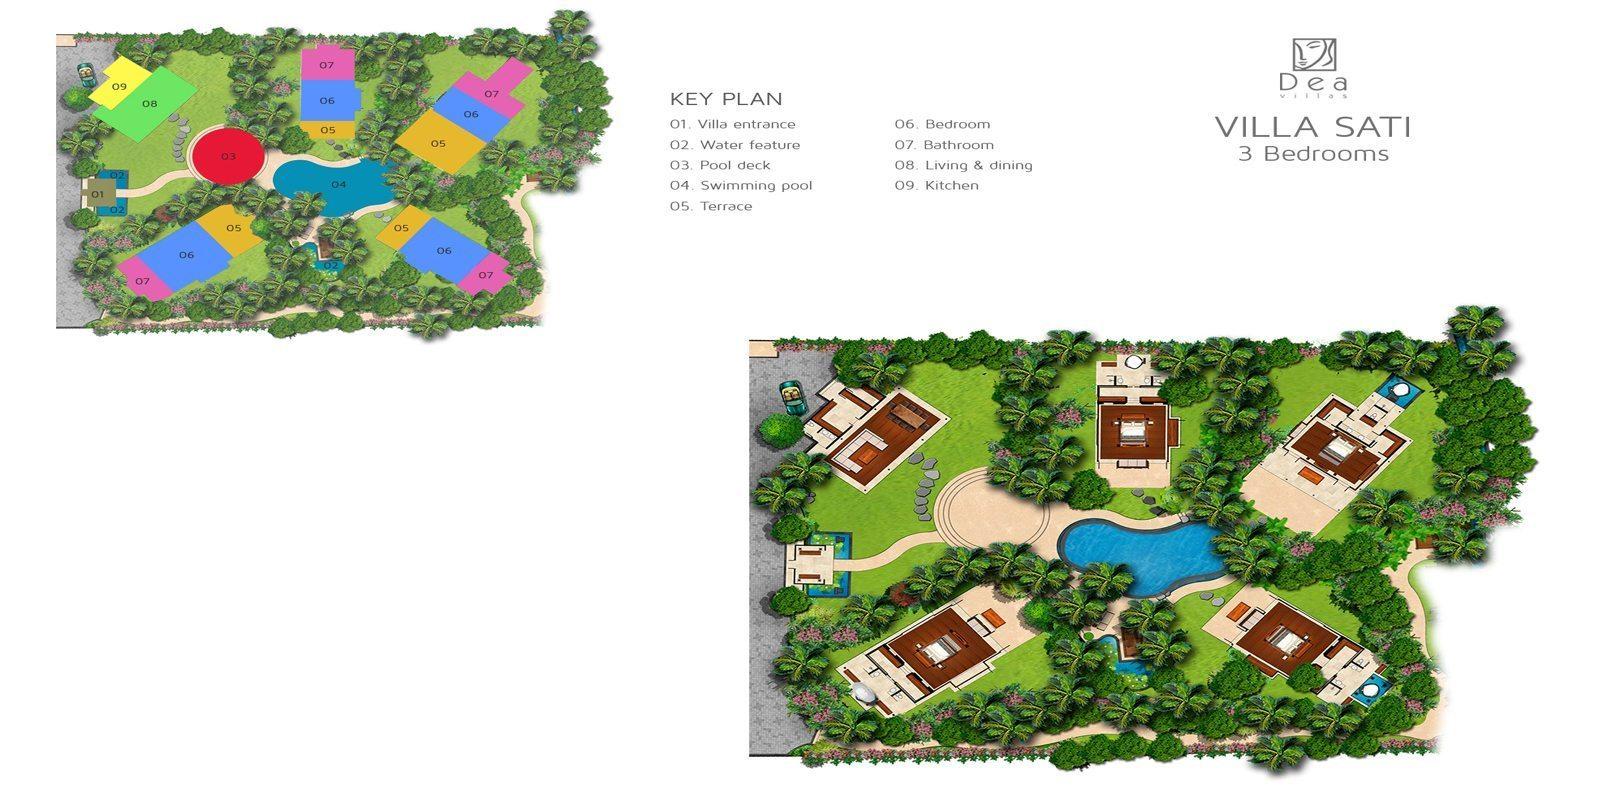 Villa Sati Floorplan | Canggu, Bali